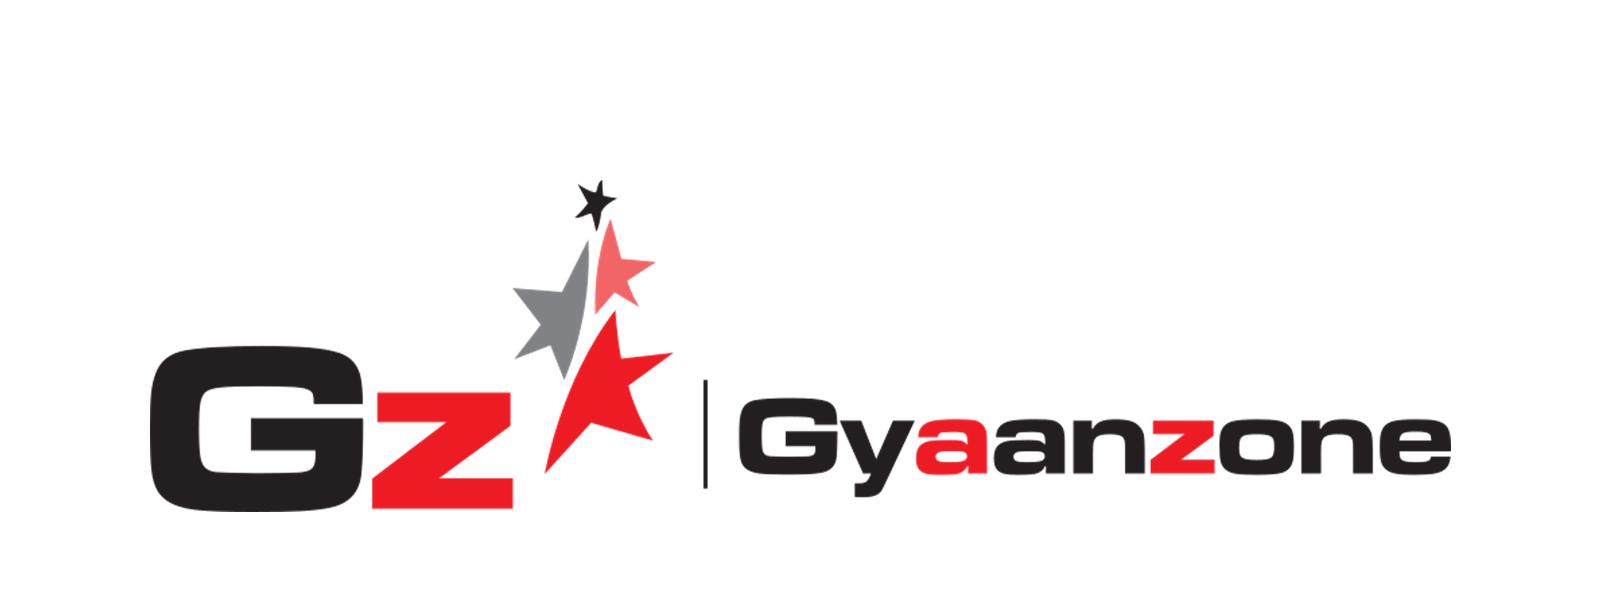 Gyaanzone company logo